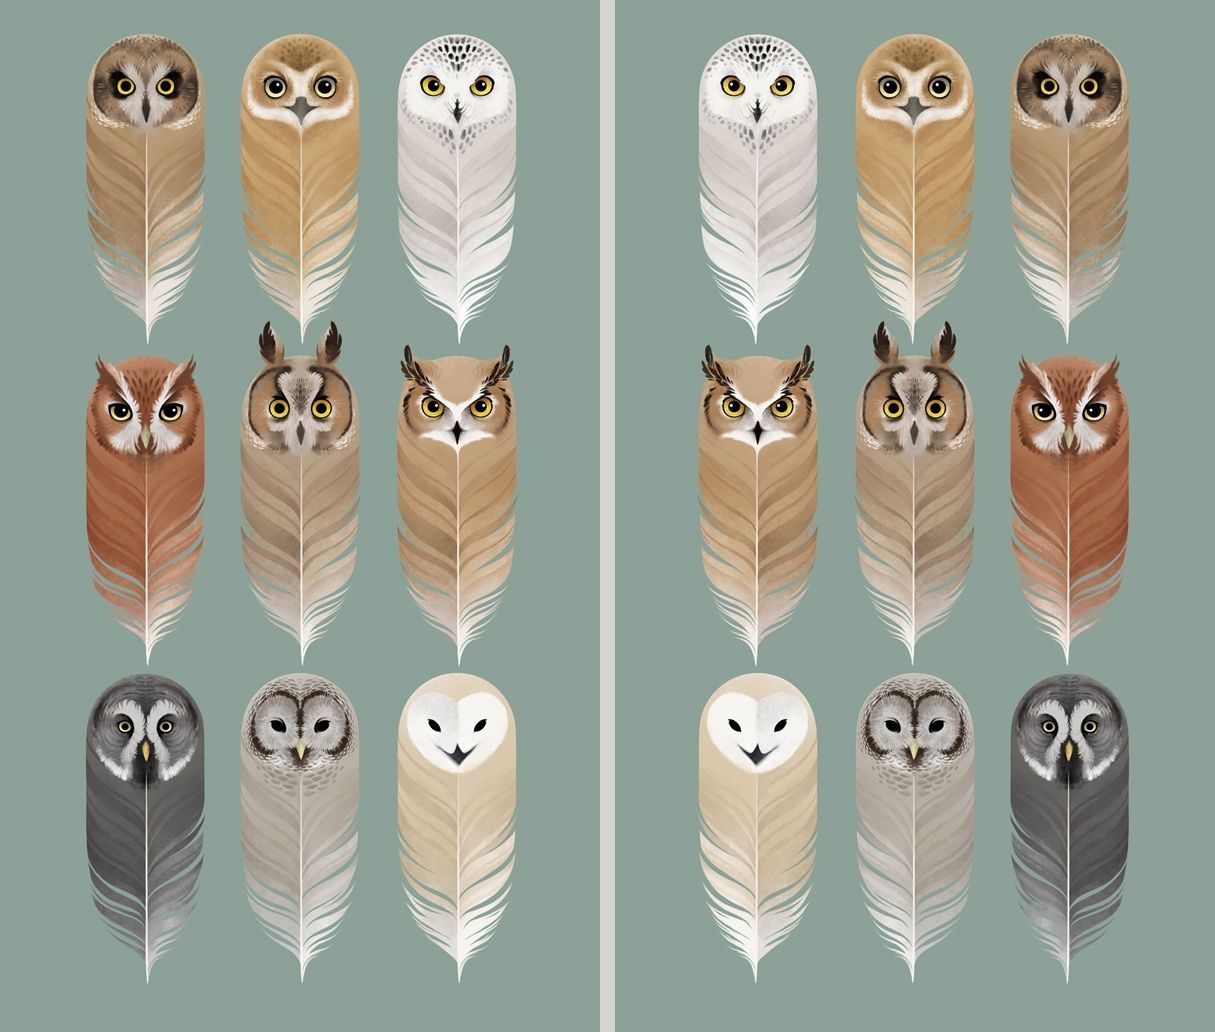 Pinyasmin Morgado On Cartoon | Pinterest | Manualidades - Free Printable Owl Bookmarks